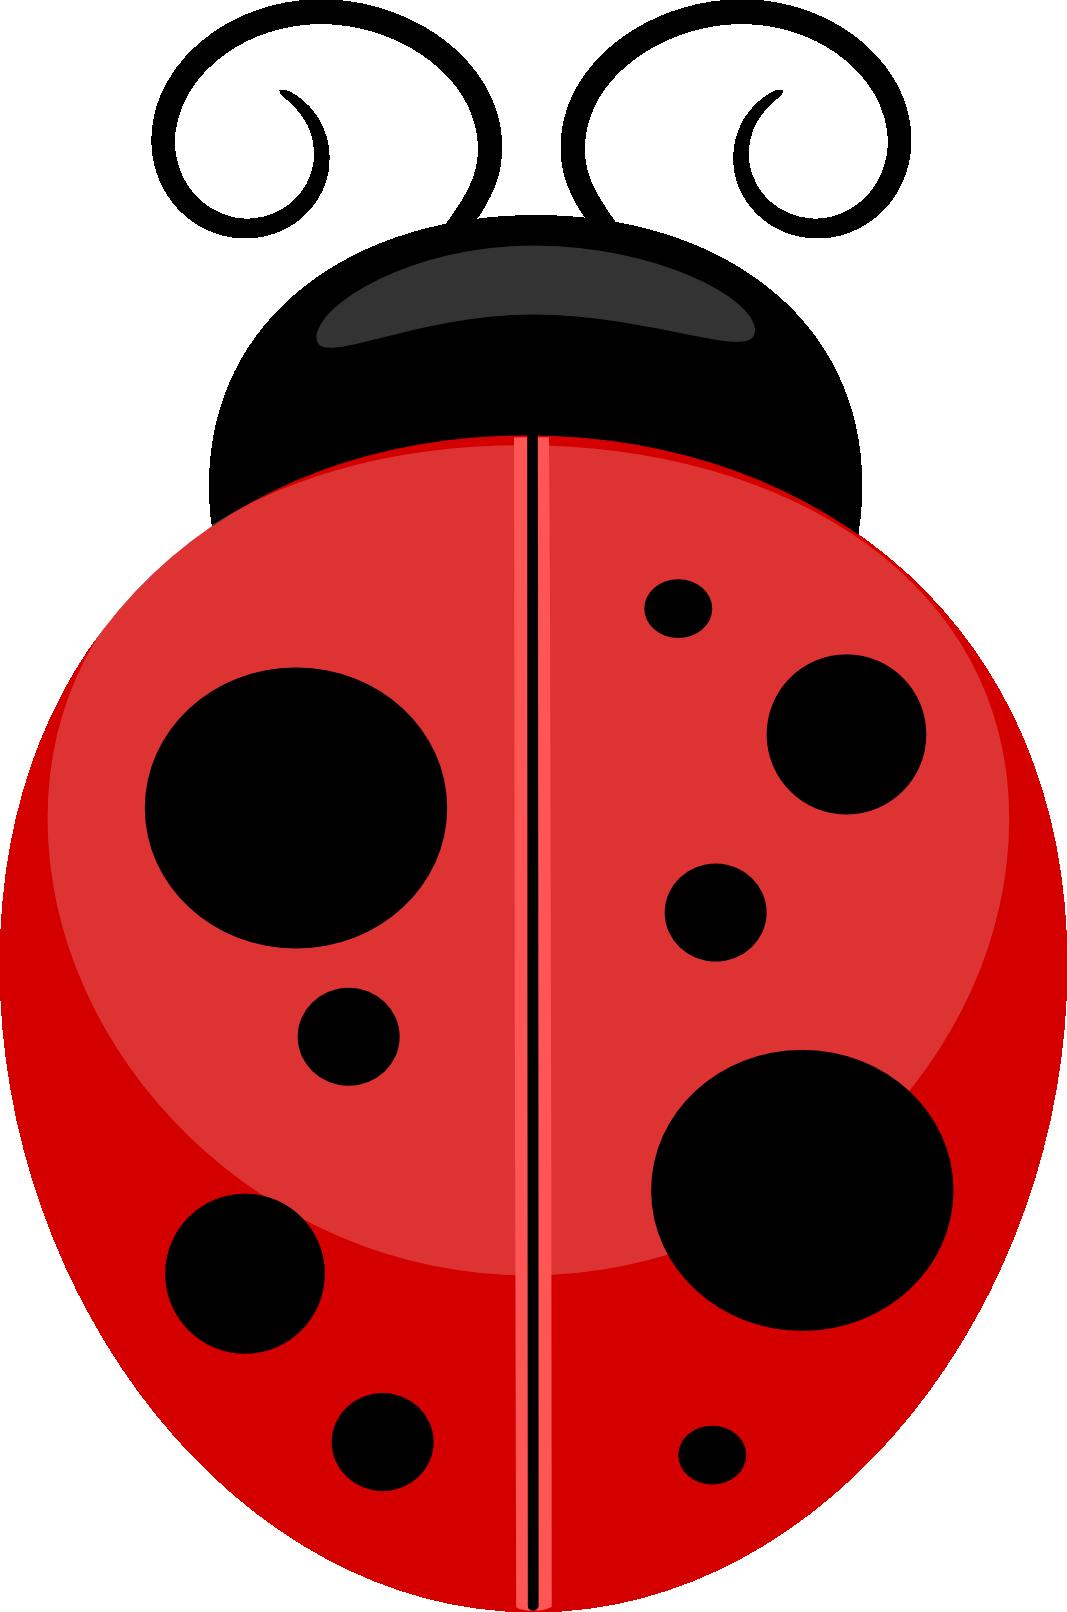 image stock Mixed clip art pinterest. Ladybug clipart transparent background.